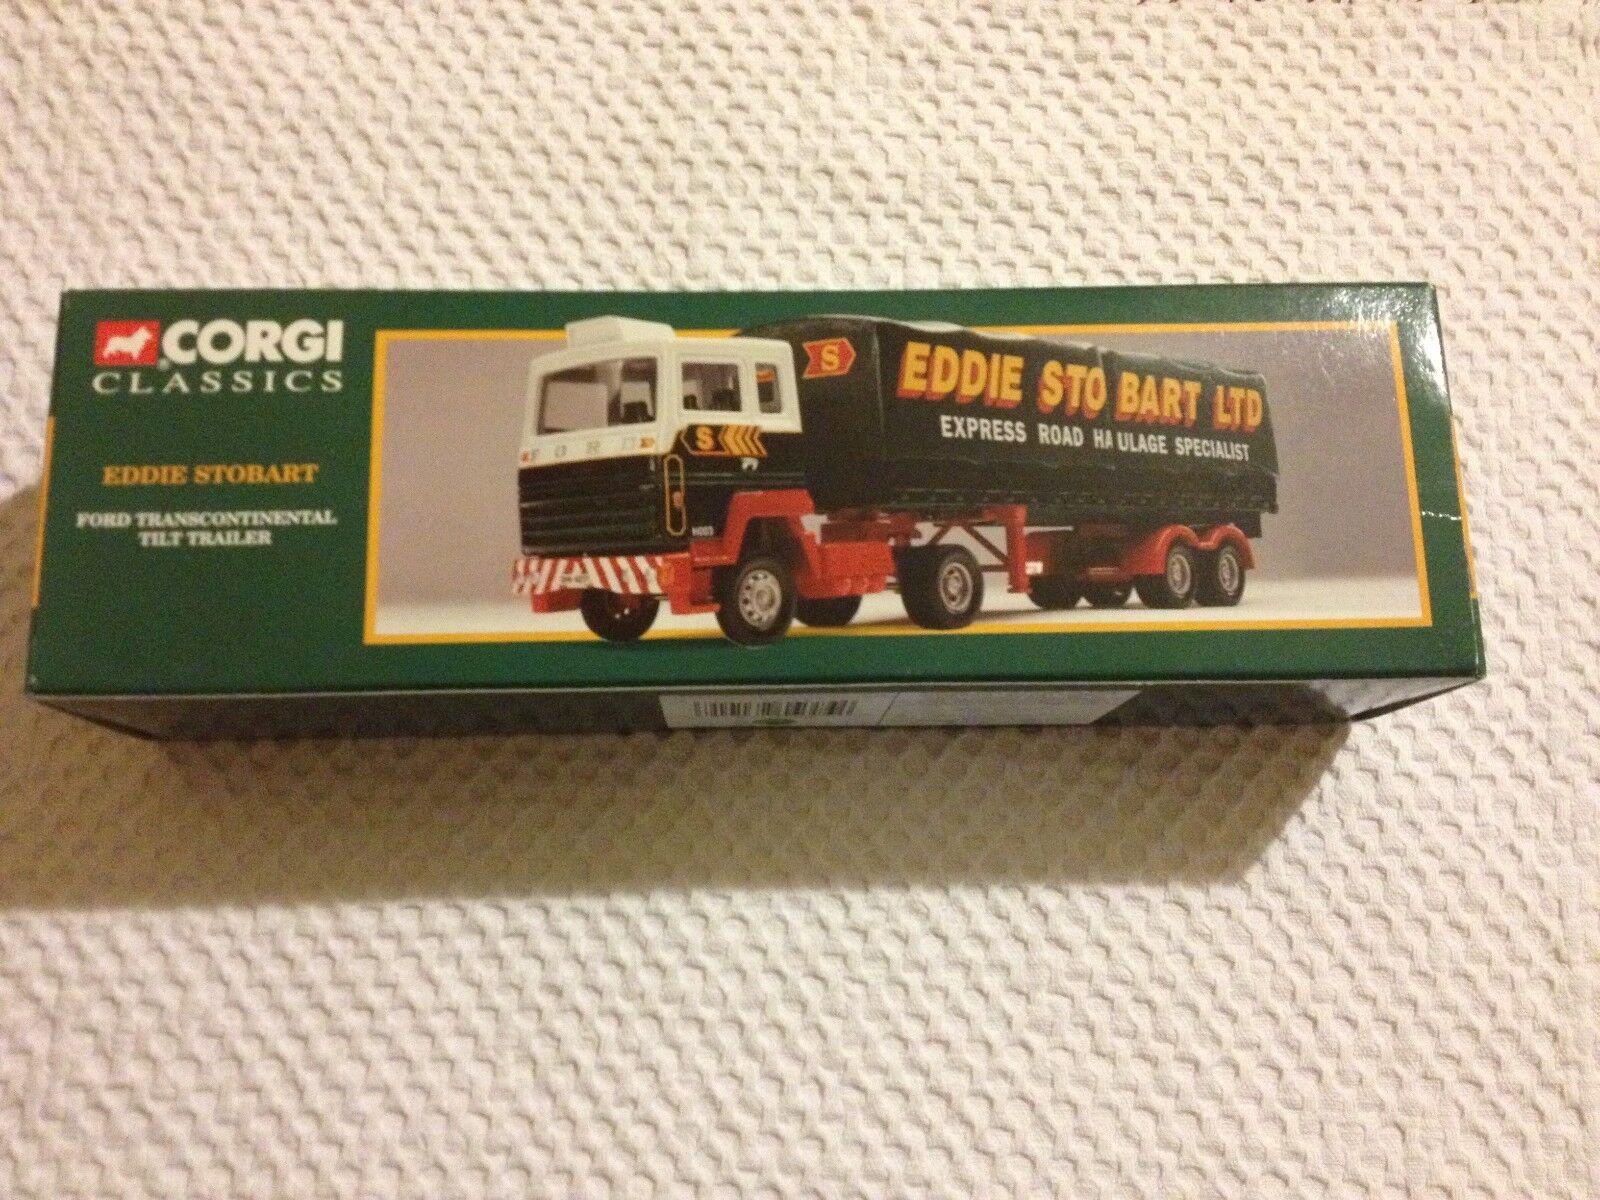 Corgi Classics Eddie Stobart 23101 Ford Transcontinental Tilt Trailer